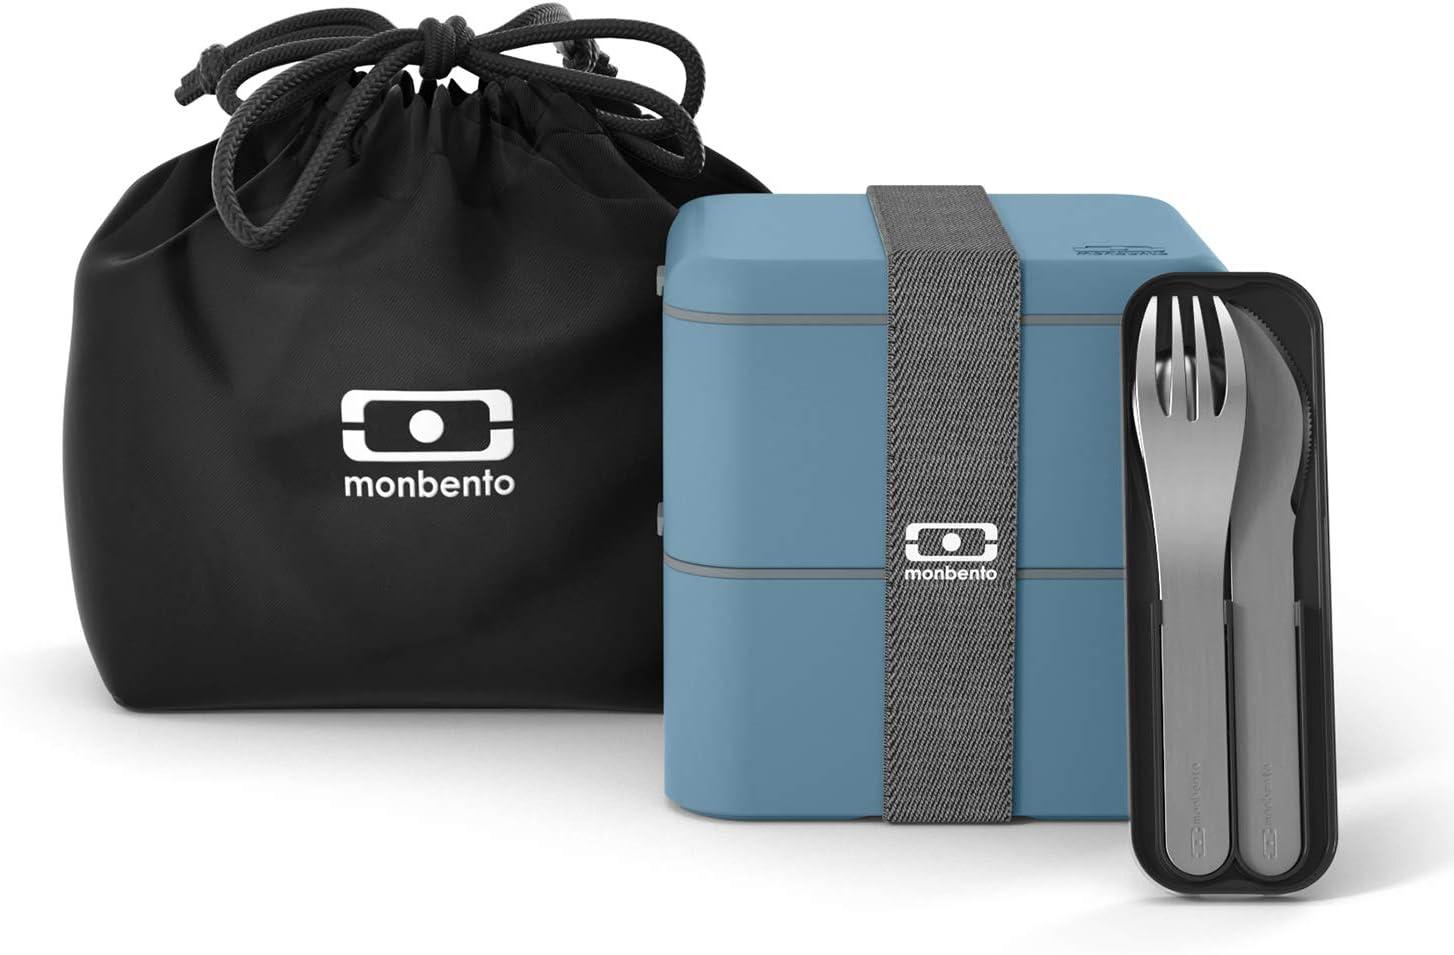 monbento - Pack Lunch Box Azul Denim - con MB Square Azul Denim Fiambrera Lunch Box, MB Pocket Negro Cubiertos para Llevar con Estuche Biodegradable y Bolsa Fiambrera MB Pochette Negro